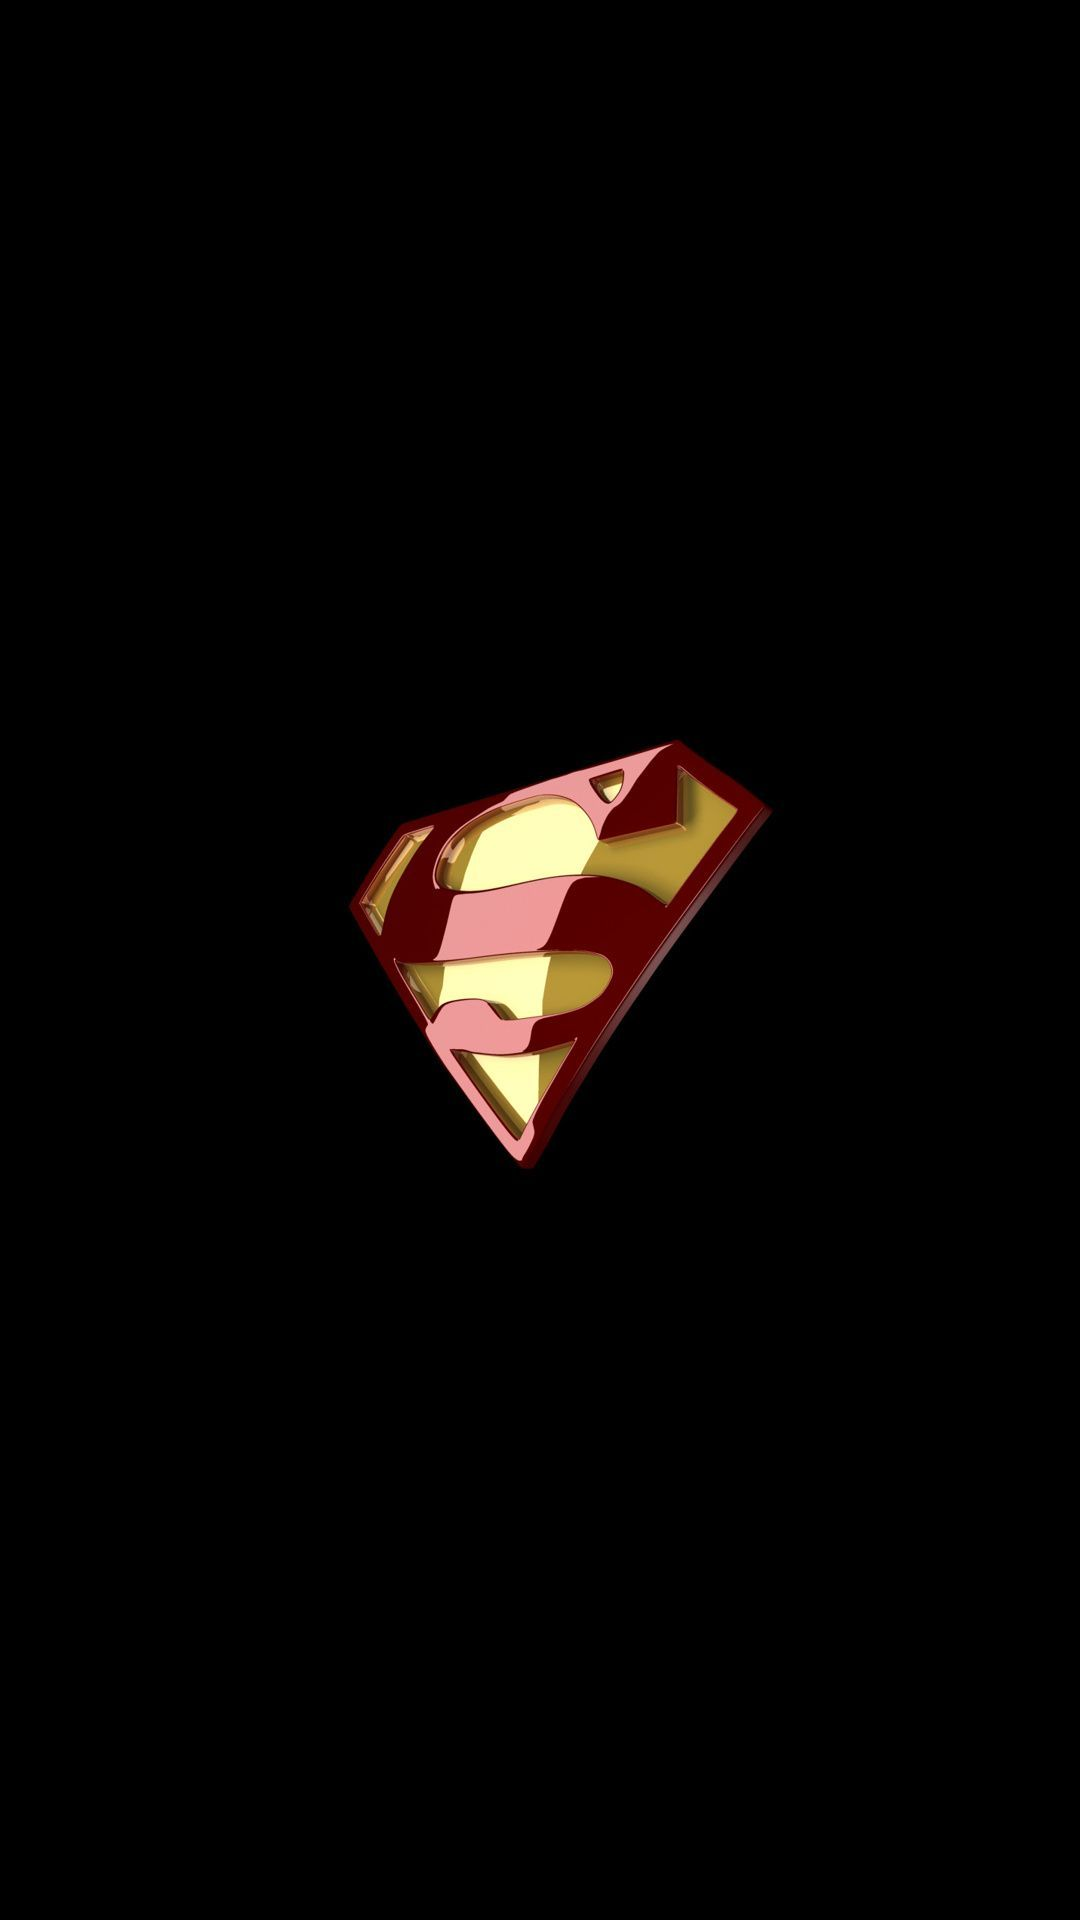 Superman Iphone Background Superman Wallpaper Logo Superman Wallpaper Superman Hd Wallpaper